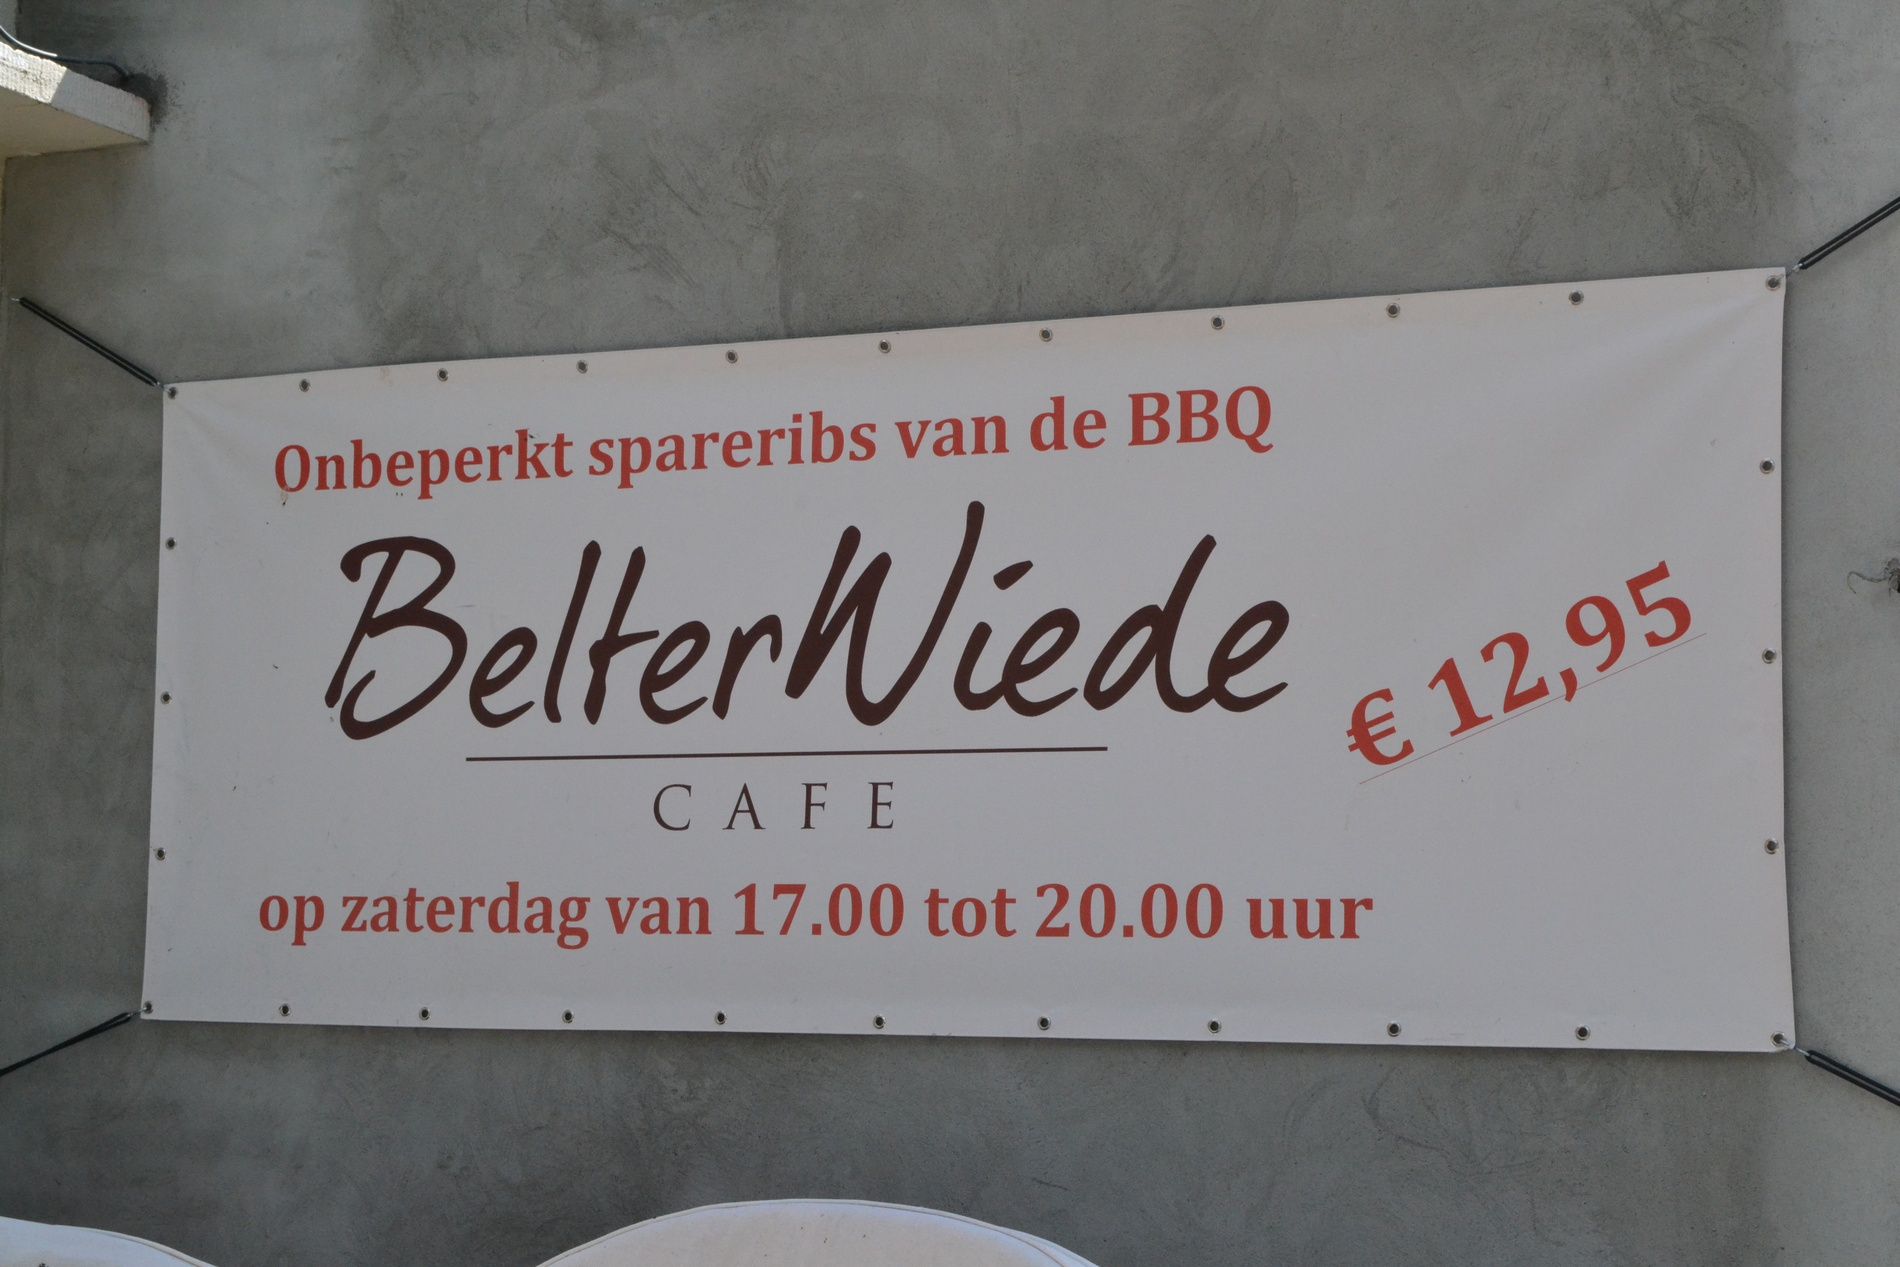 Spareribs Restaurant Belterwiede Wanneperveen